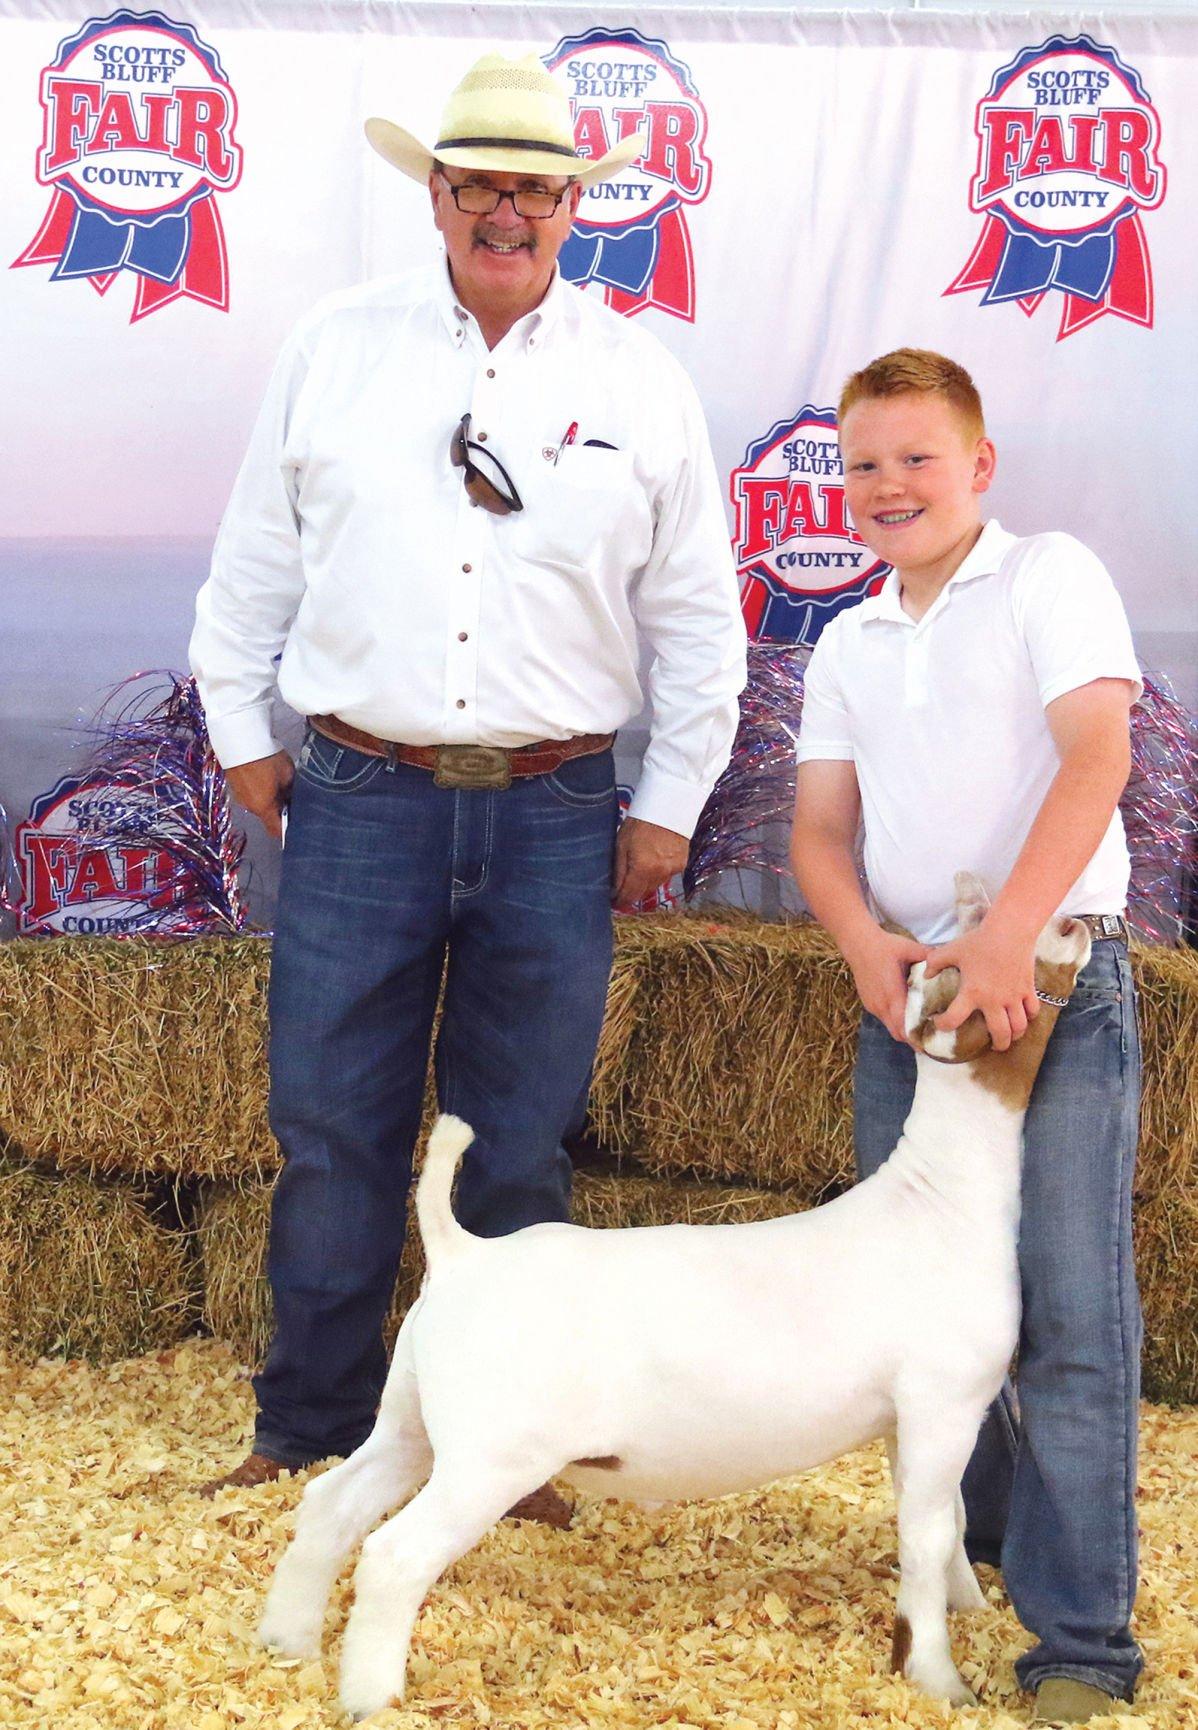 PHOTOS: Scotts Bluff County Fair Livestock Sale 8-18